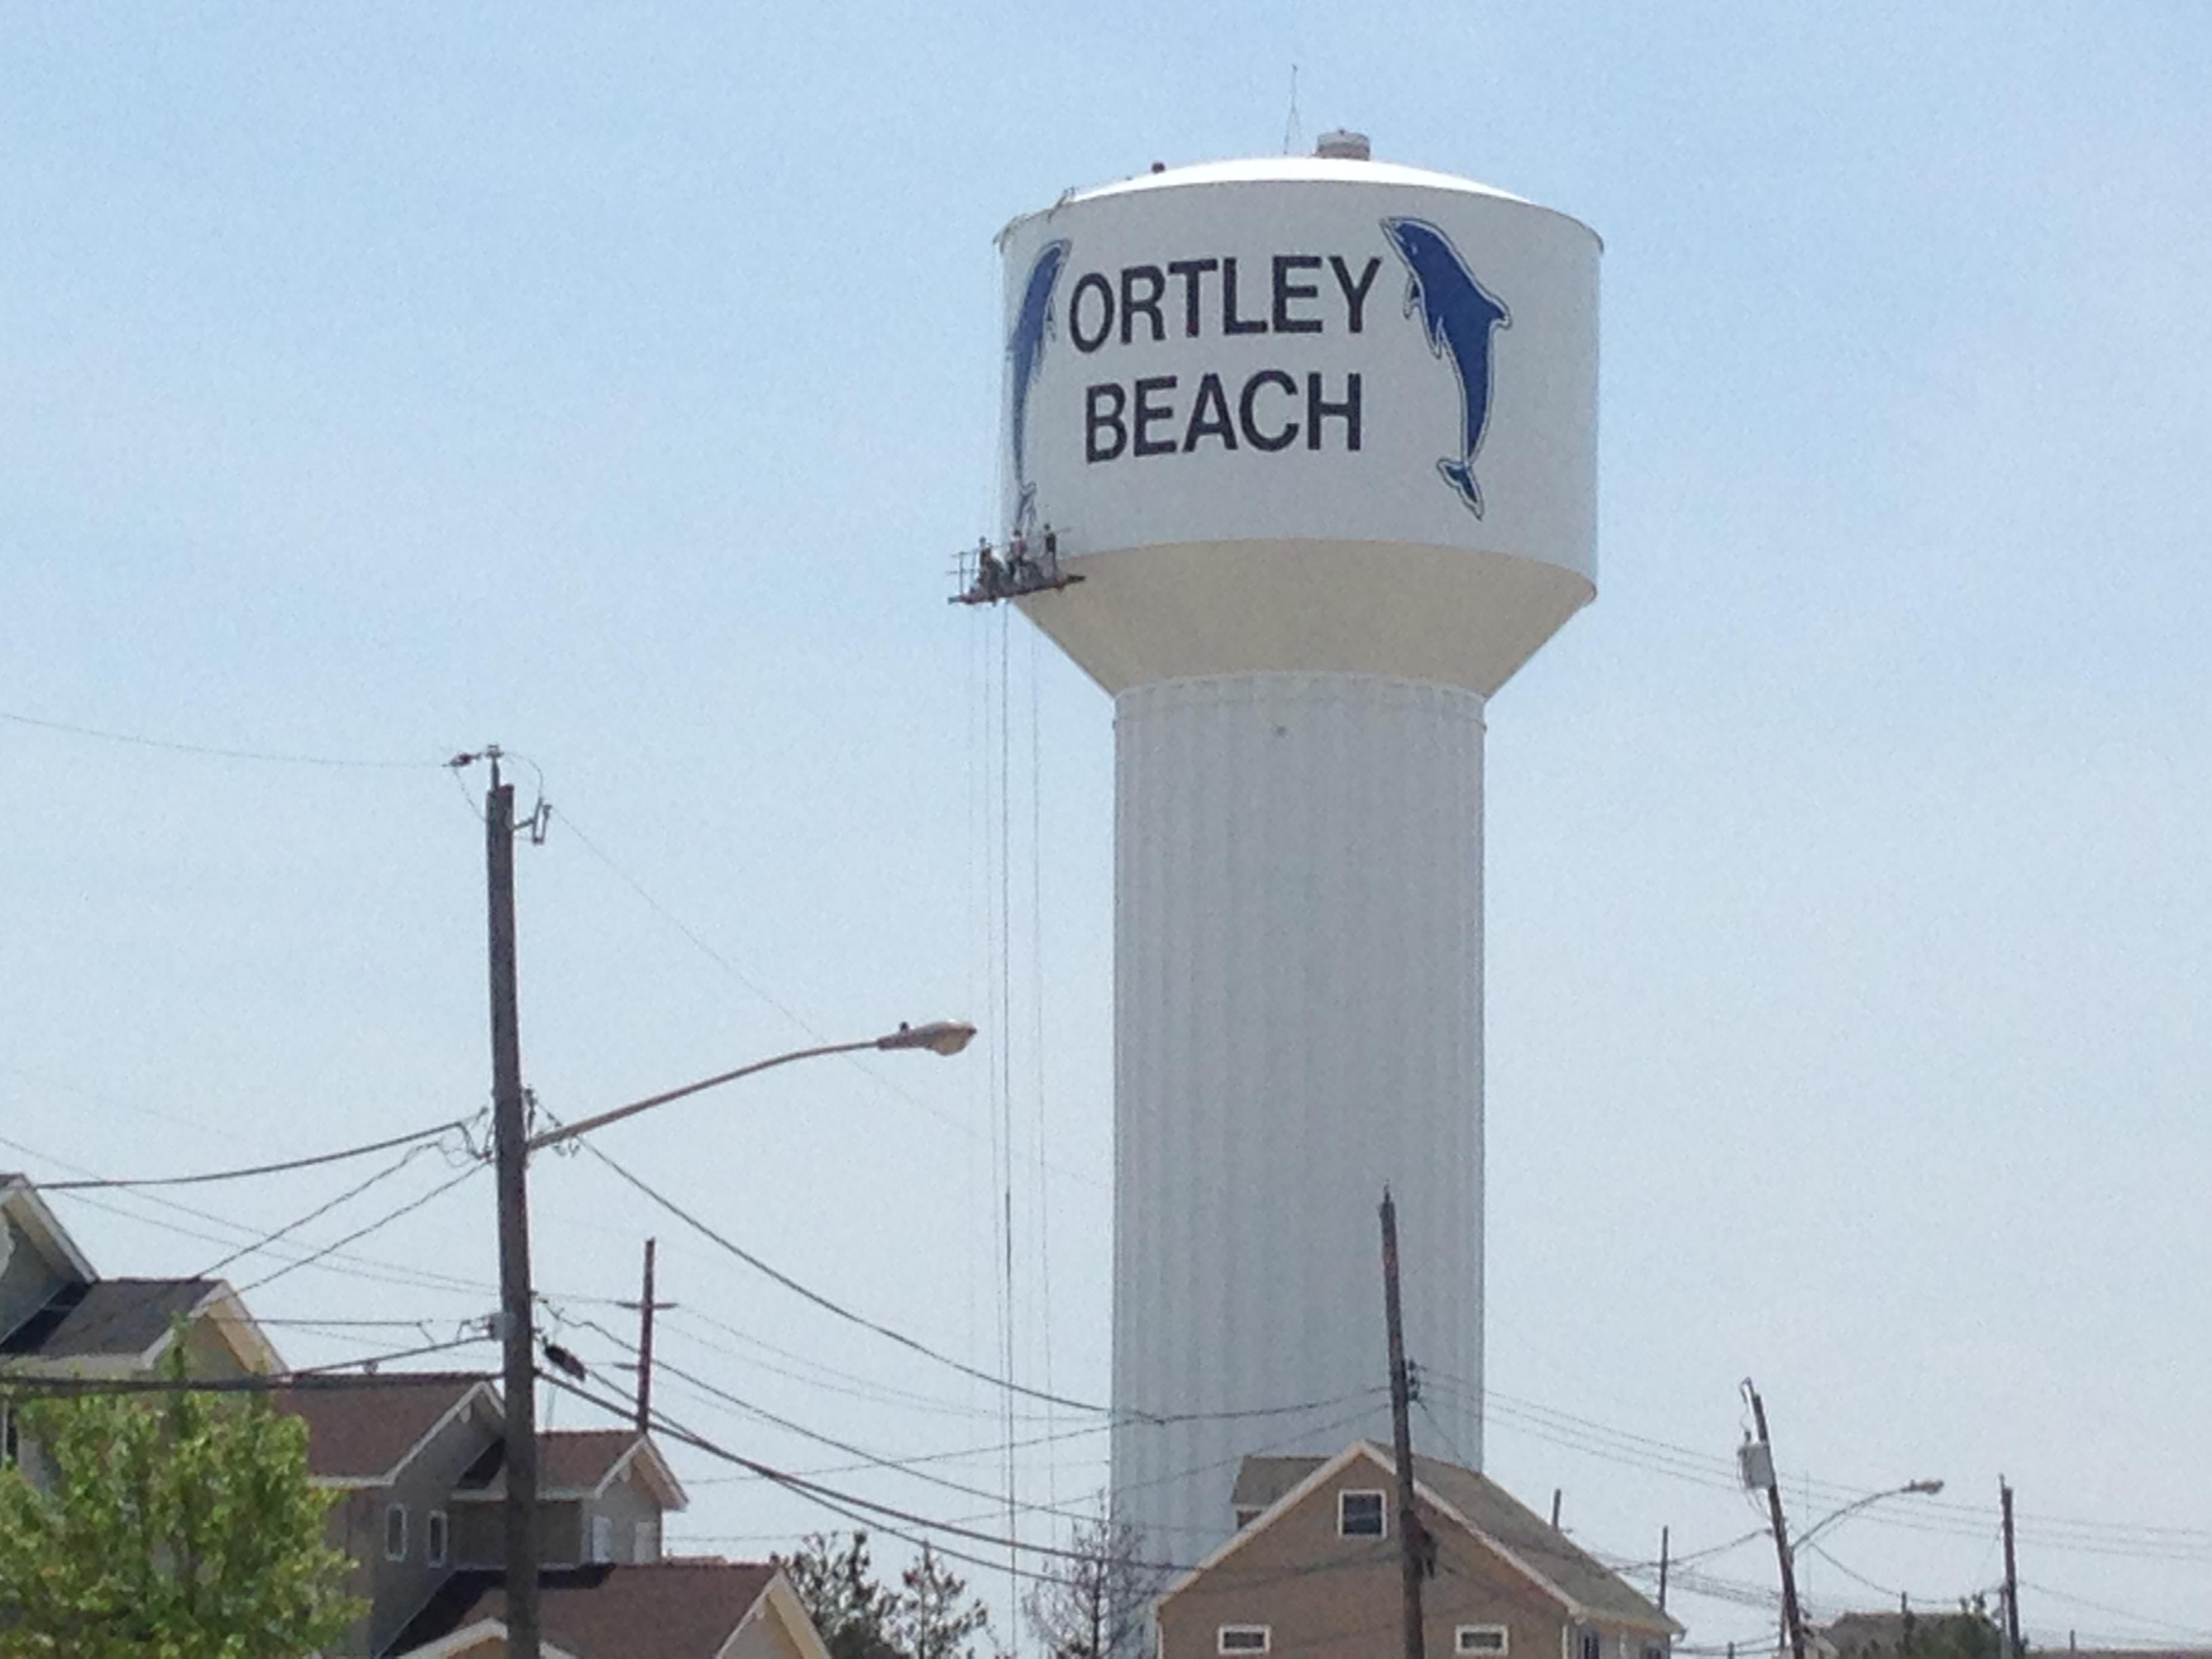 The Ortley Beach water tower. (Photo: Daniel Nee)